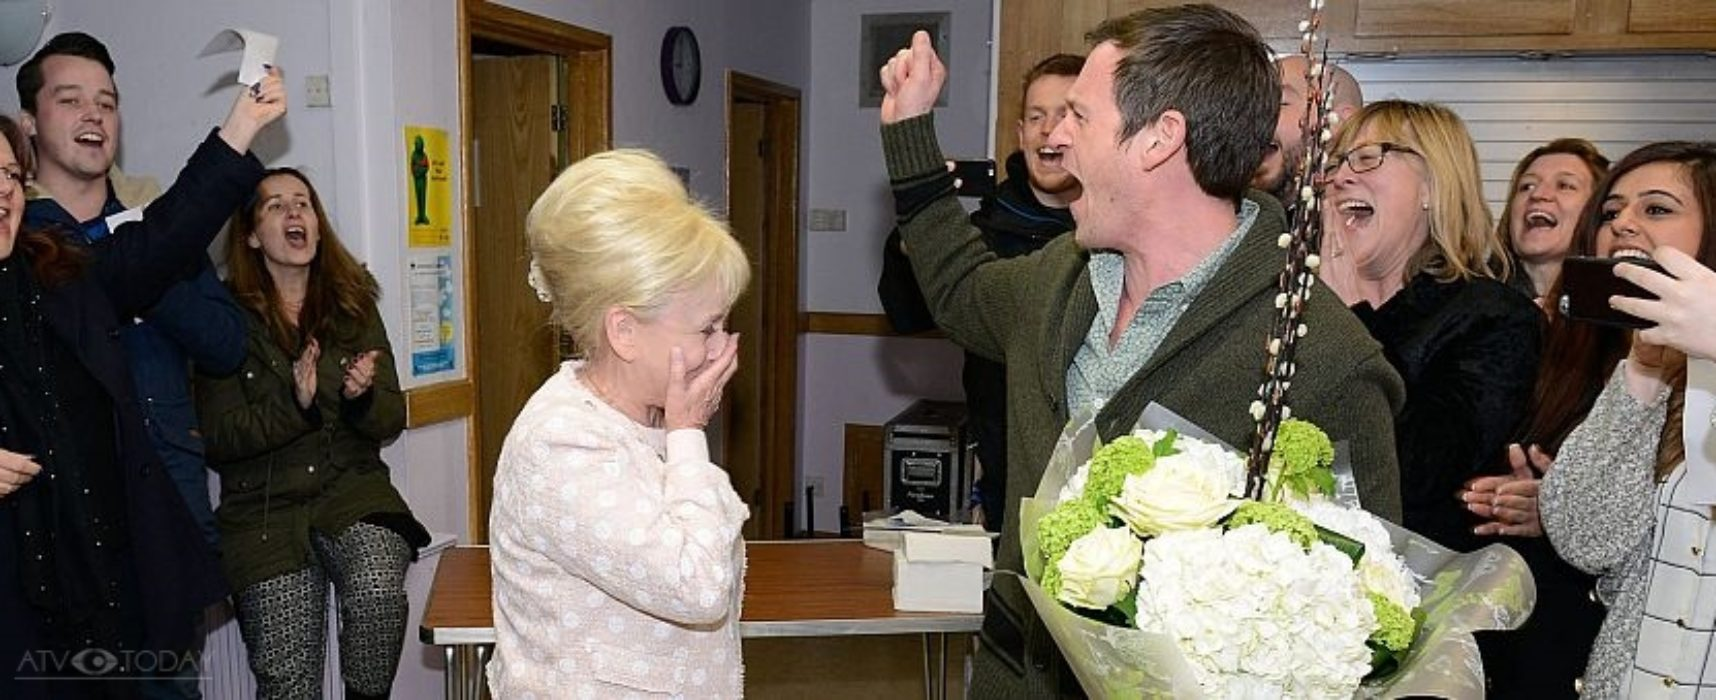 EastEnders cast and crew celebrate Barbara Windsor